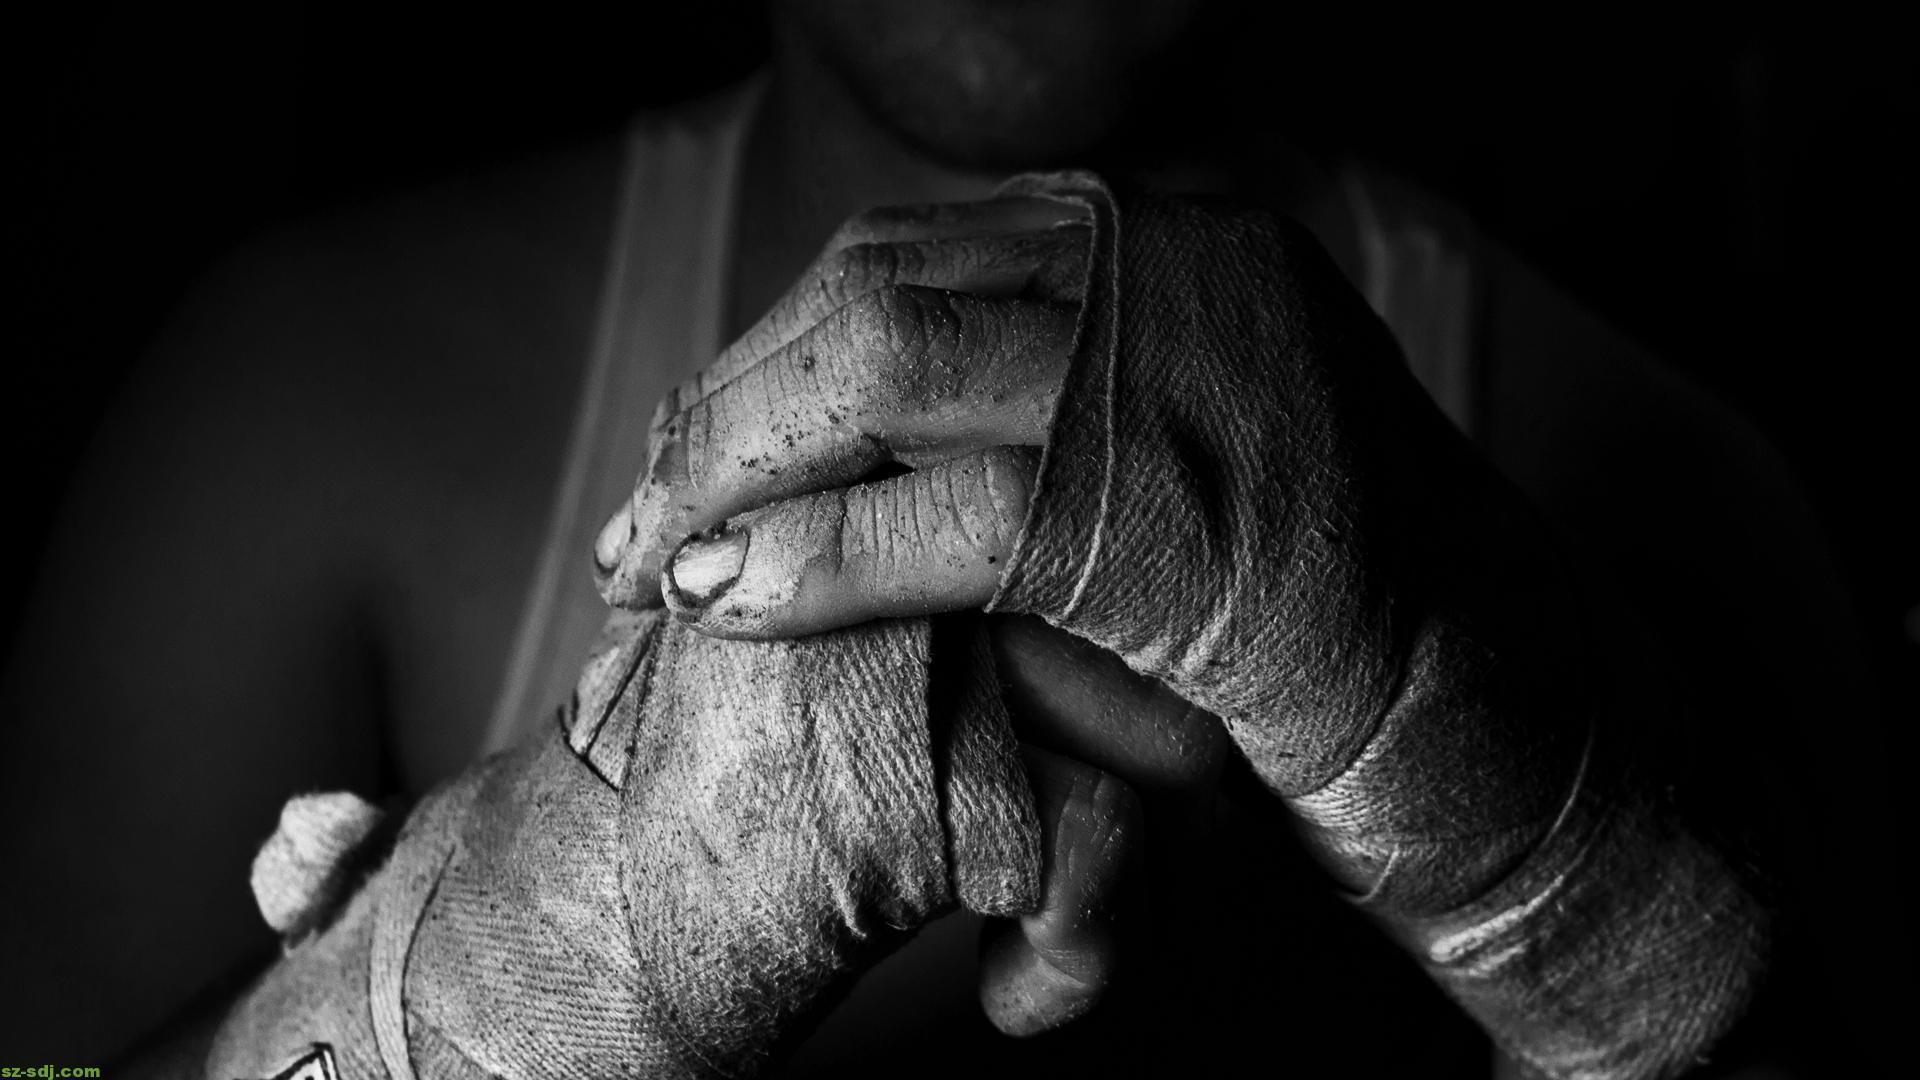 Boxing Wallpaper The Wallpaper